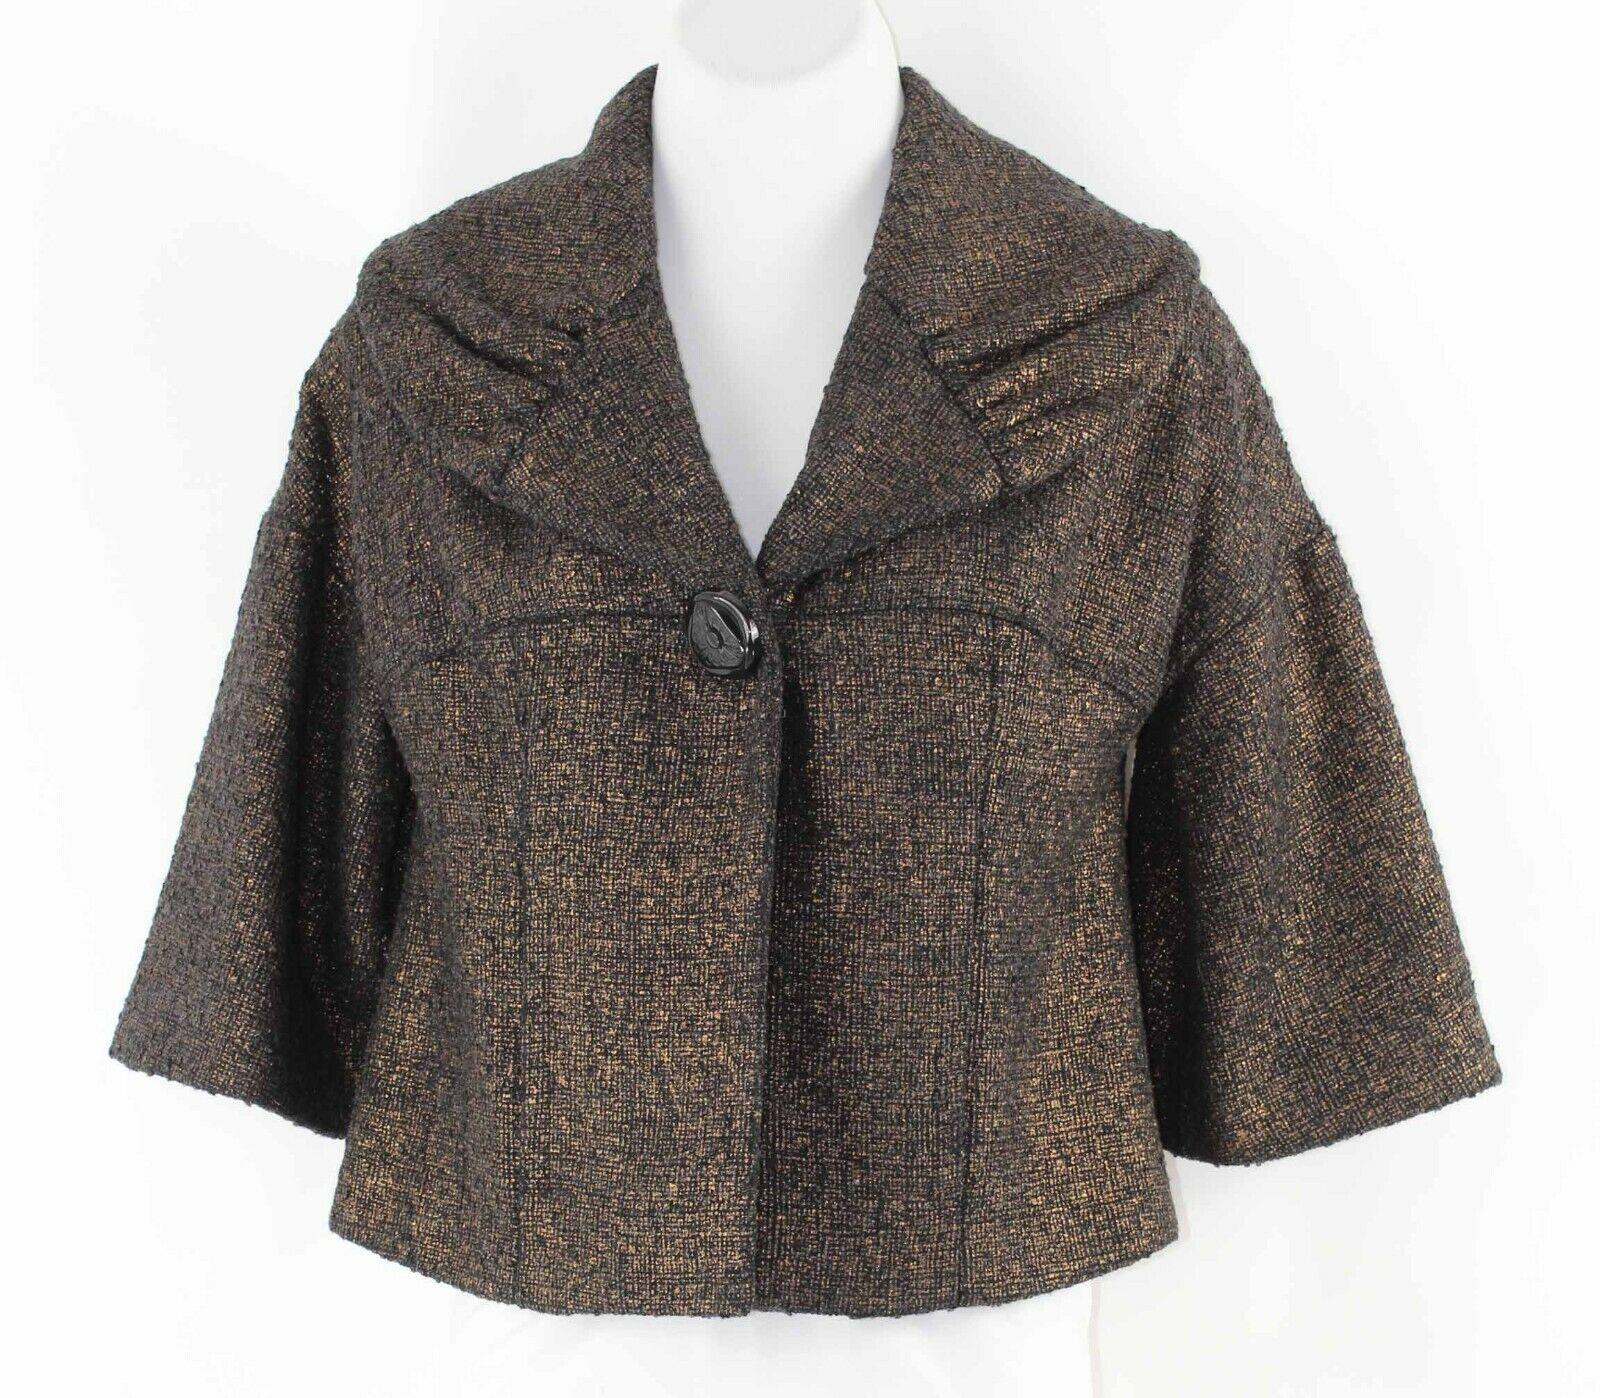 Beth Bowley Sz 4 Black Gold 1 Button Acrylic Wool Cotton Nylon Poly Jacket M004